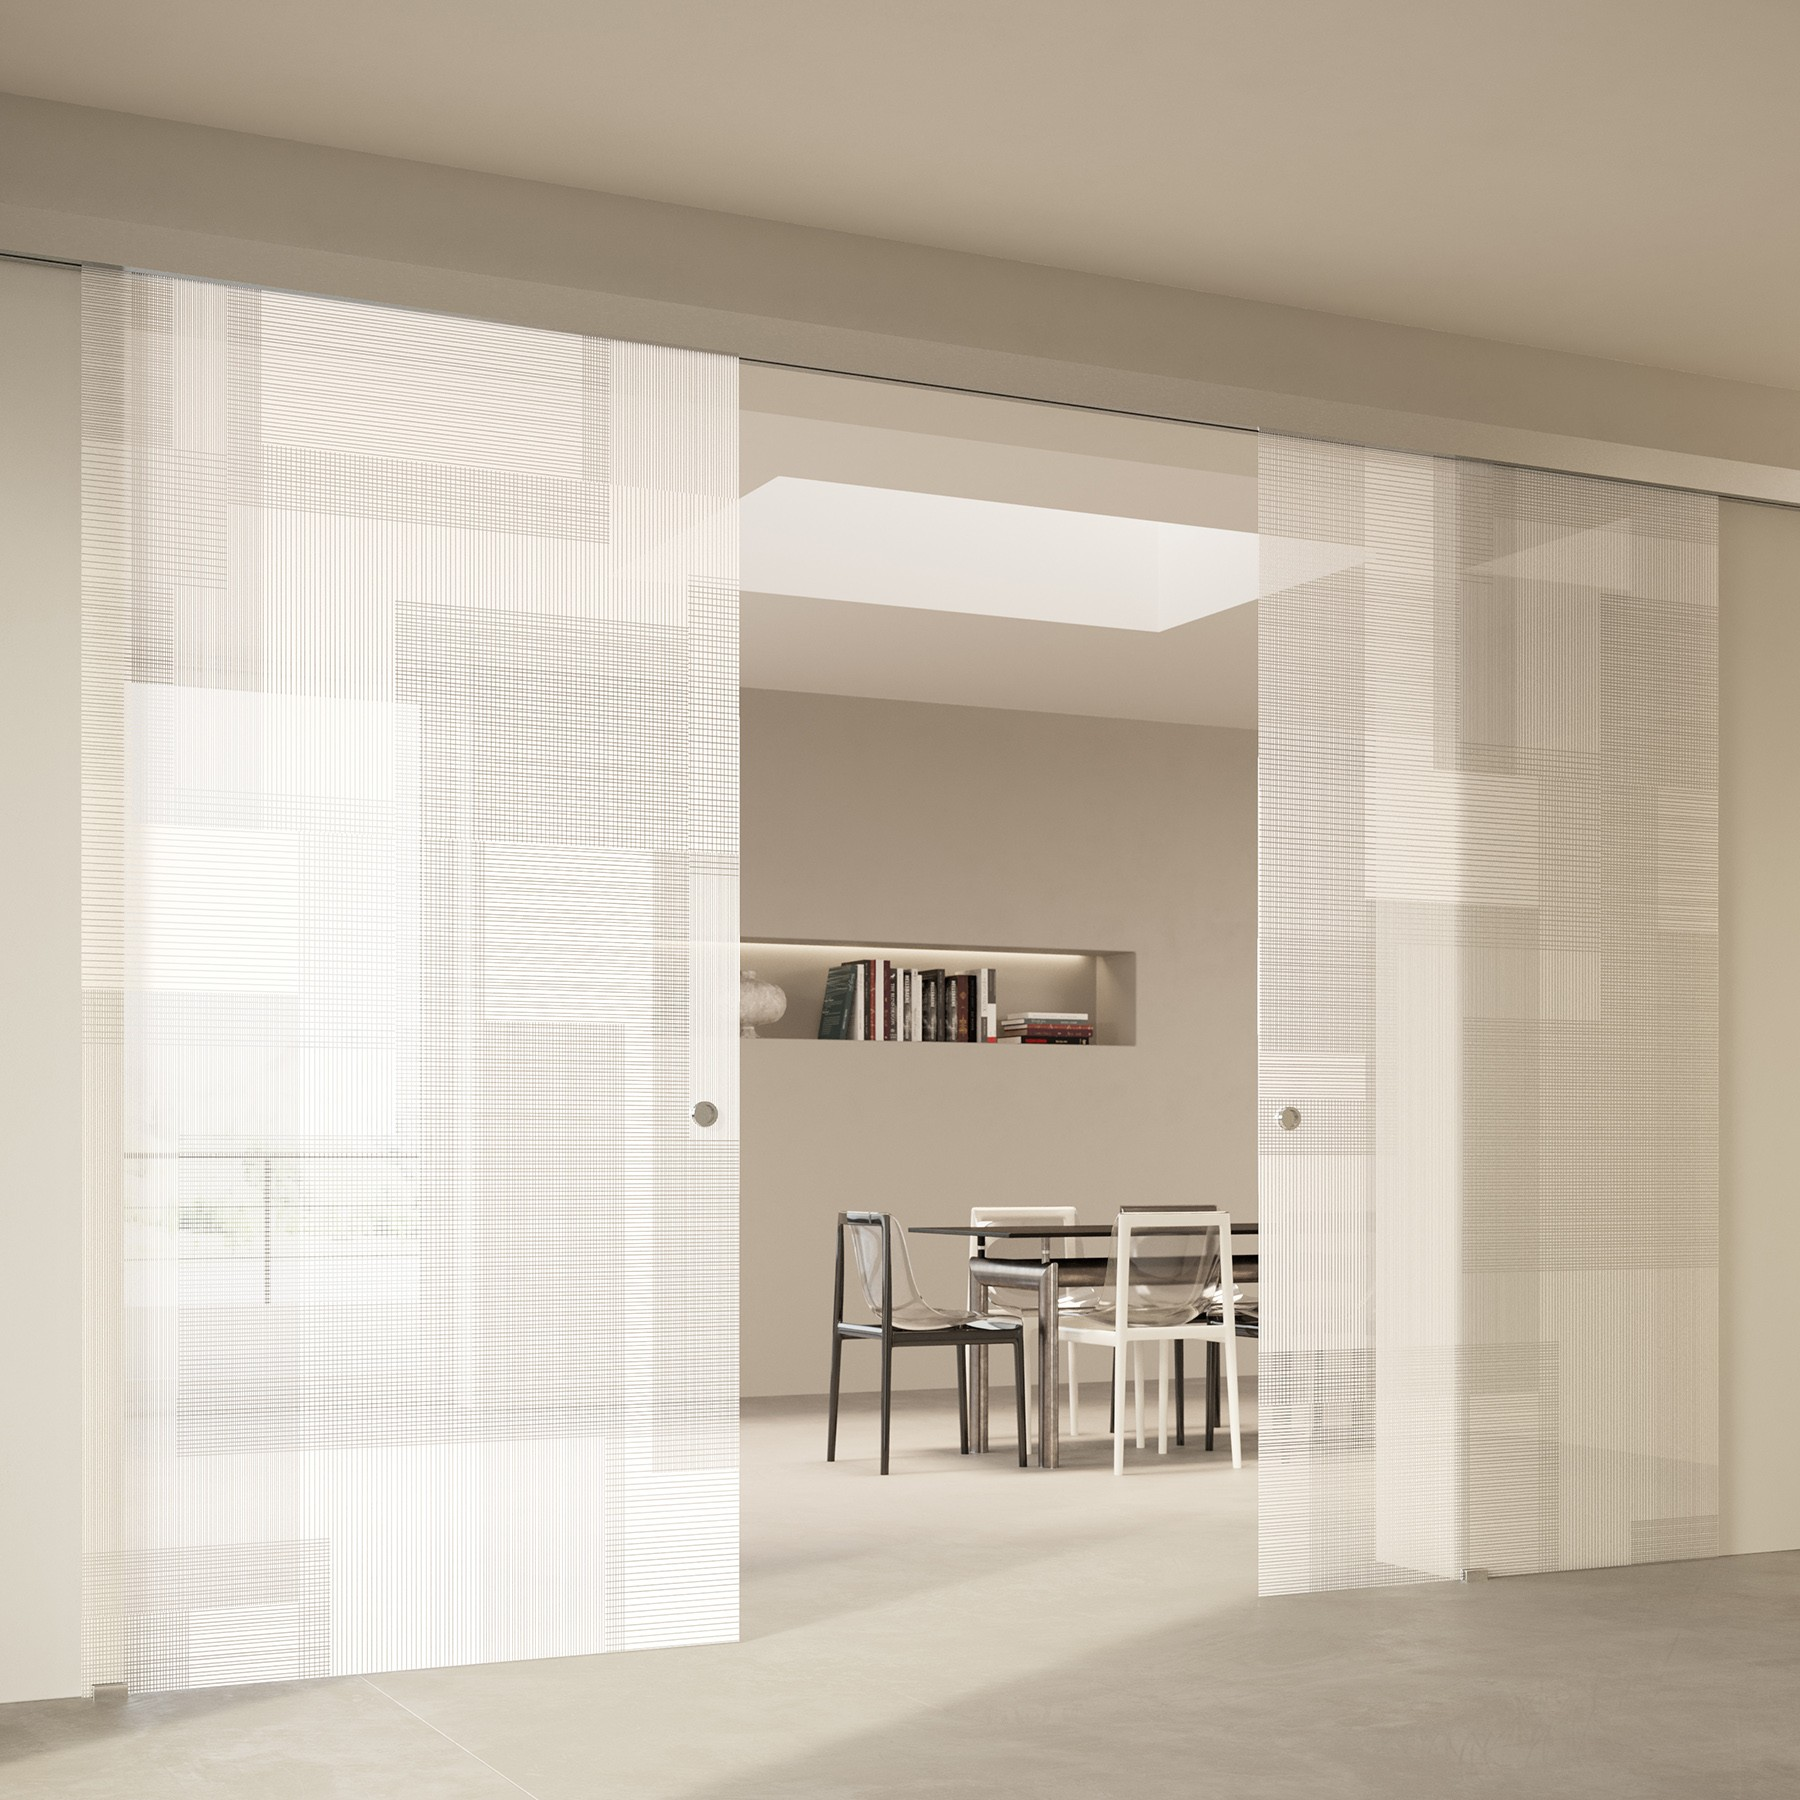 Scenario Visio Up with BIT 03 satinato extrachiaro bianco glass